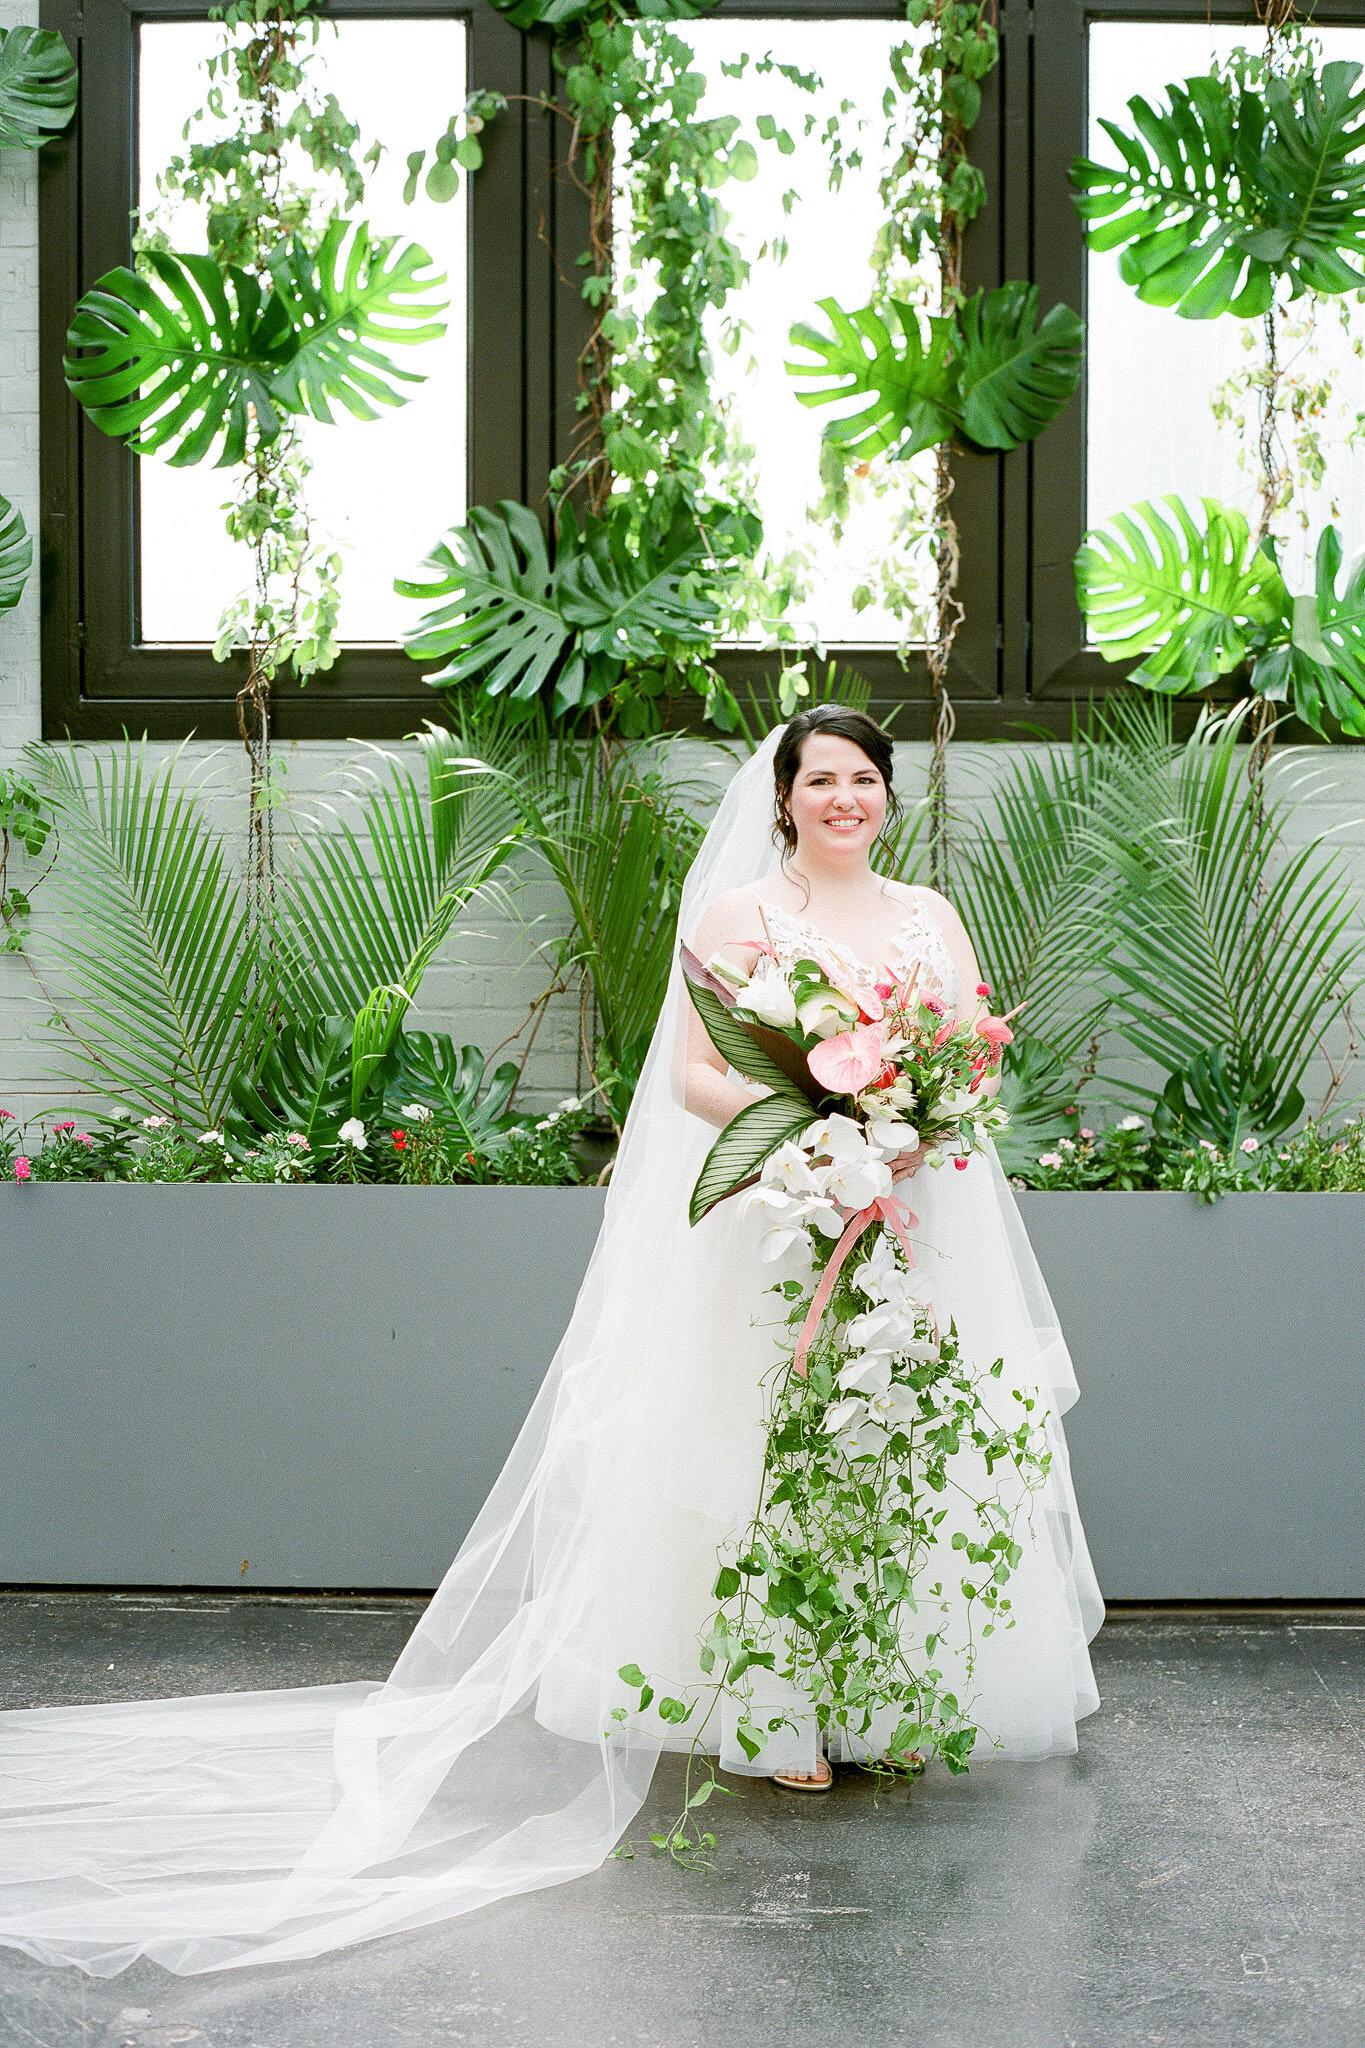 hillary-mike-wedding-bride-bouquet-02-6479427-0318.jpg